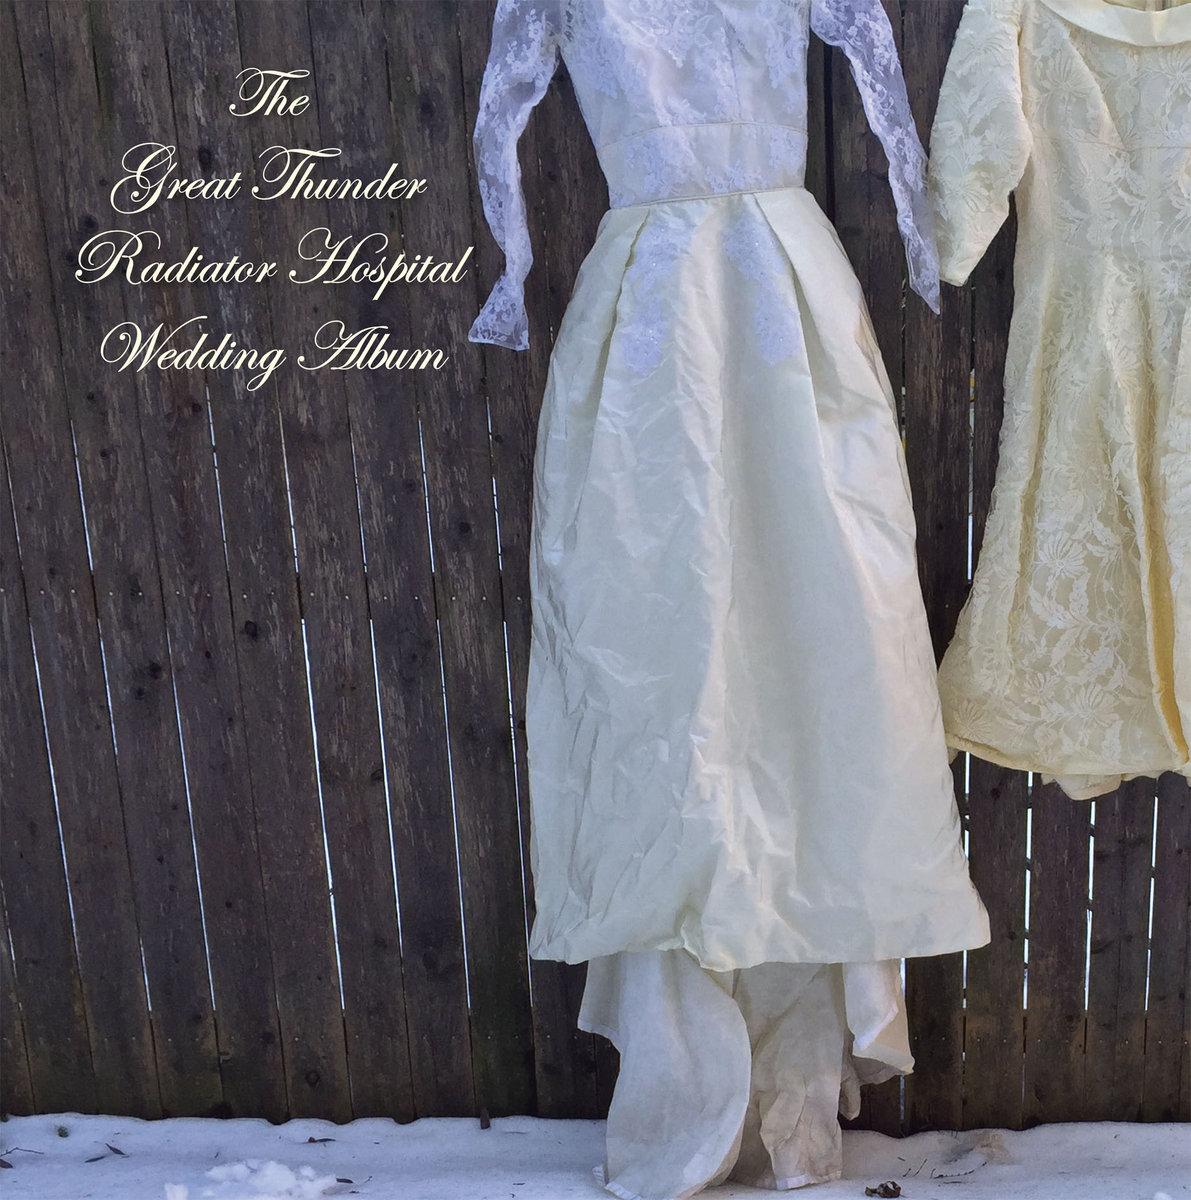 The Great Thunder & Radiator Hospital Wedding Album